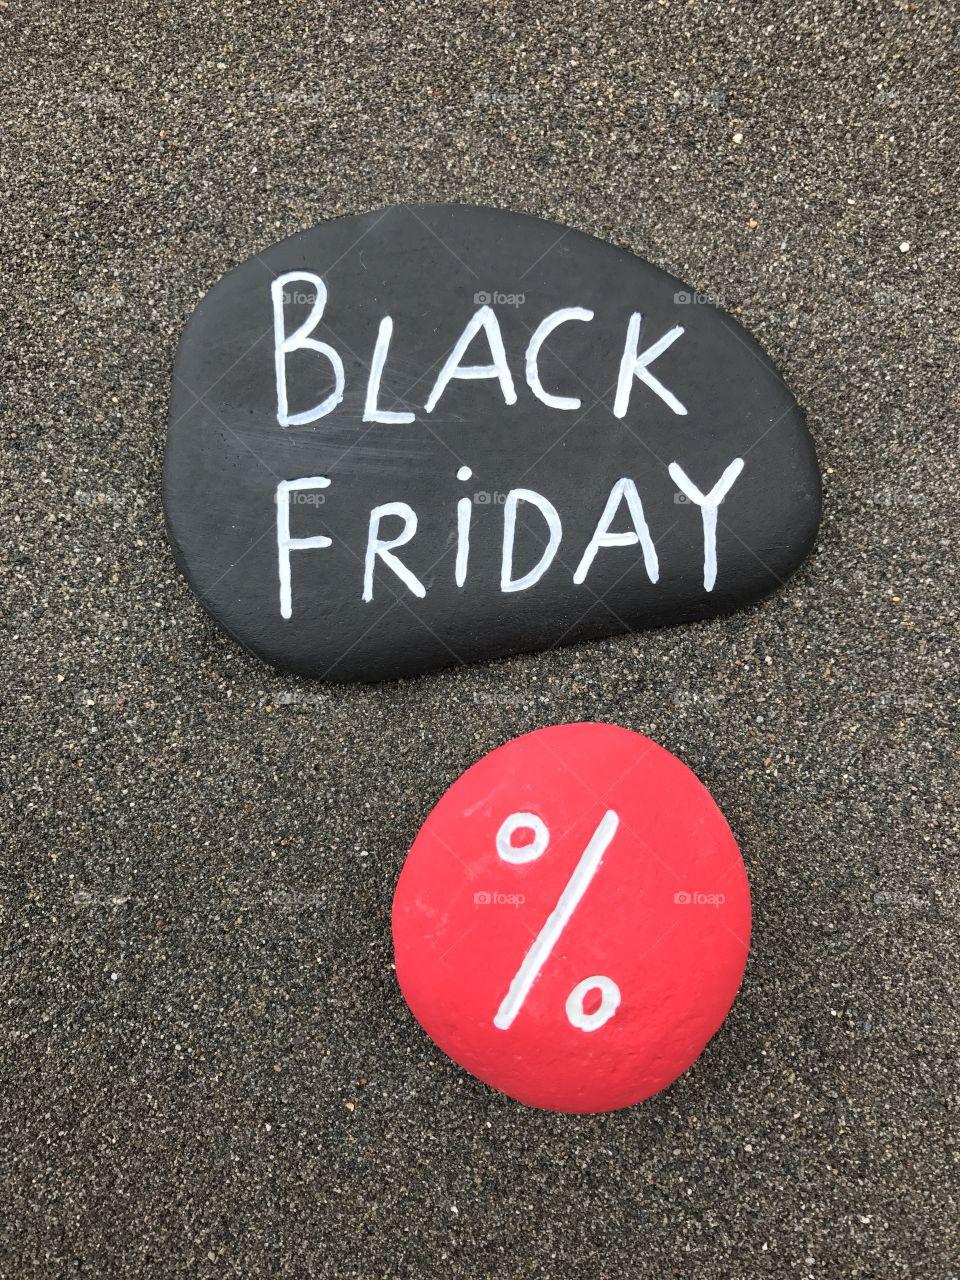 Black Friday per cent discount